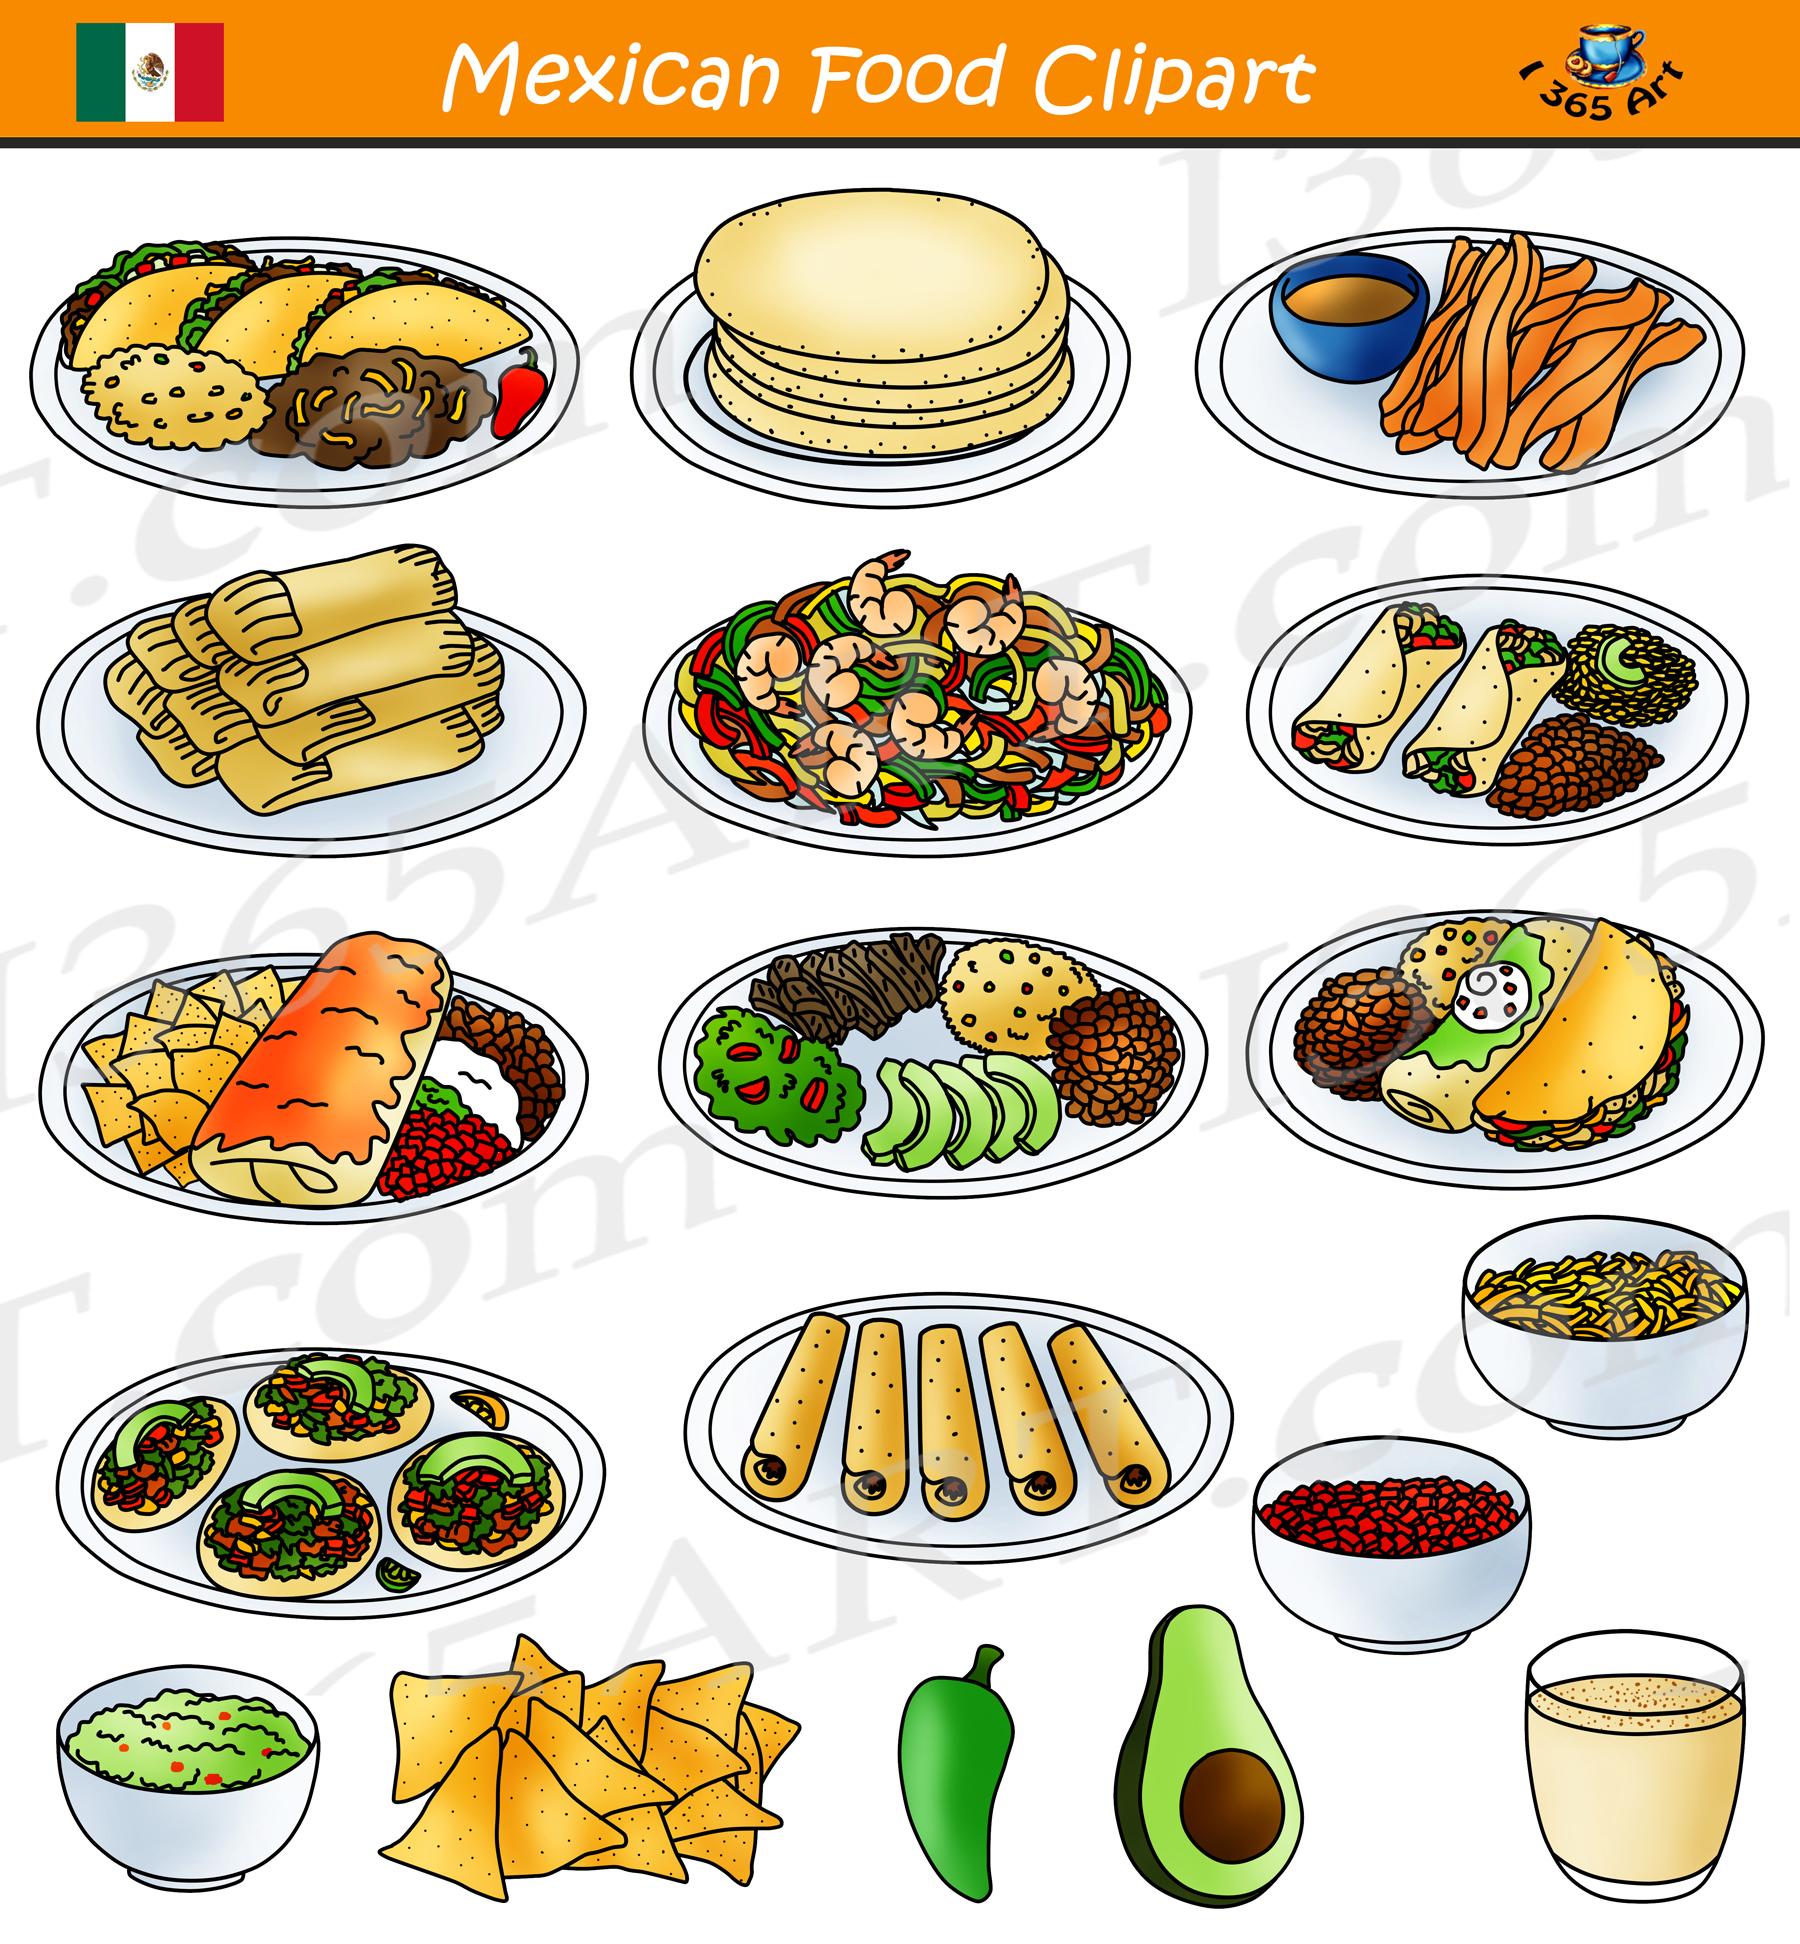 Comida clipart image freeuse stock Mexican Food Clipart - Comida Mexicana - School Clipart image freeuse stock